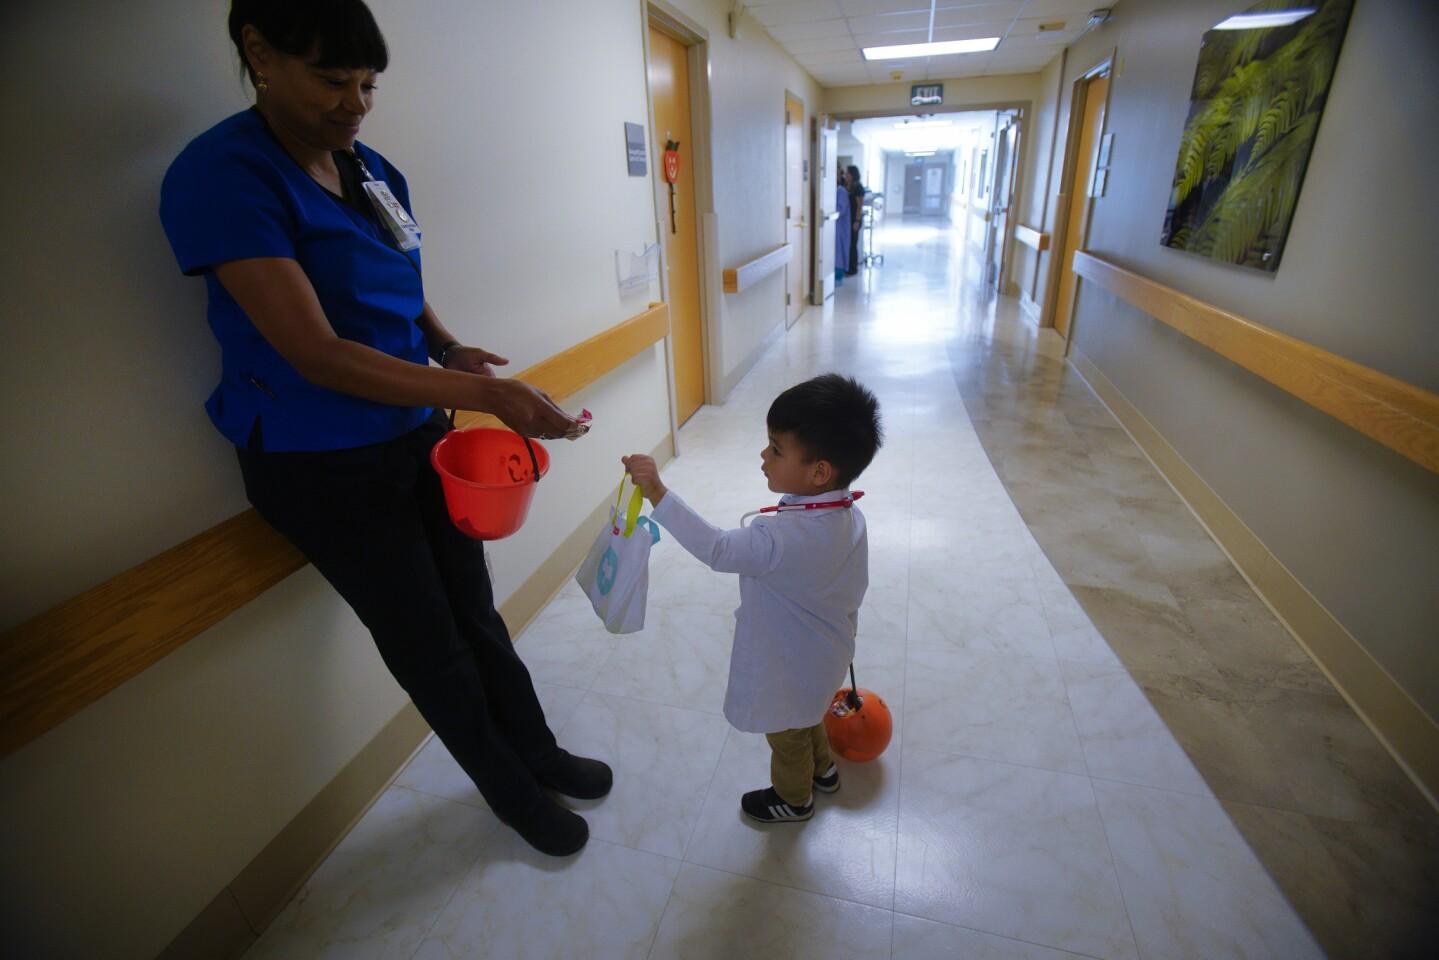 Trick or Treat at Sharp Medical Center